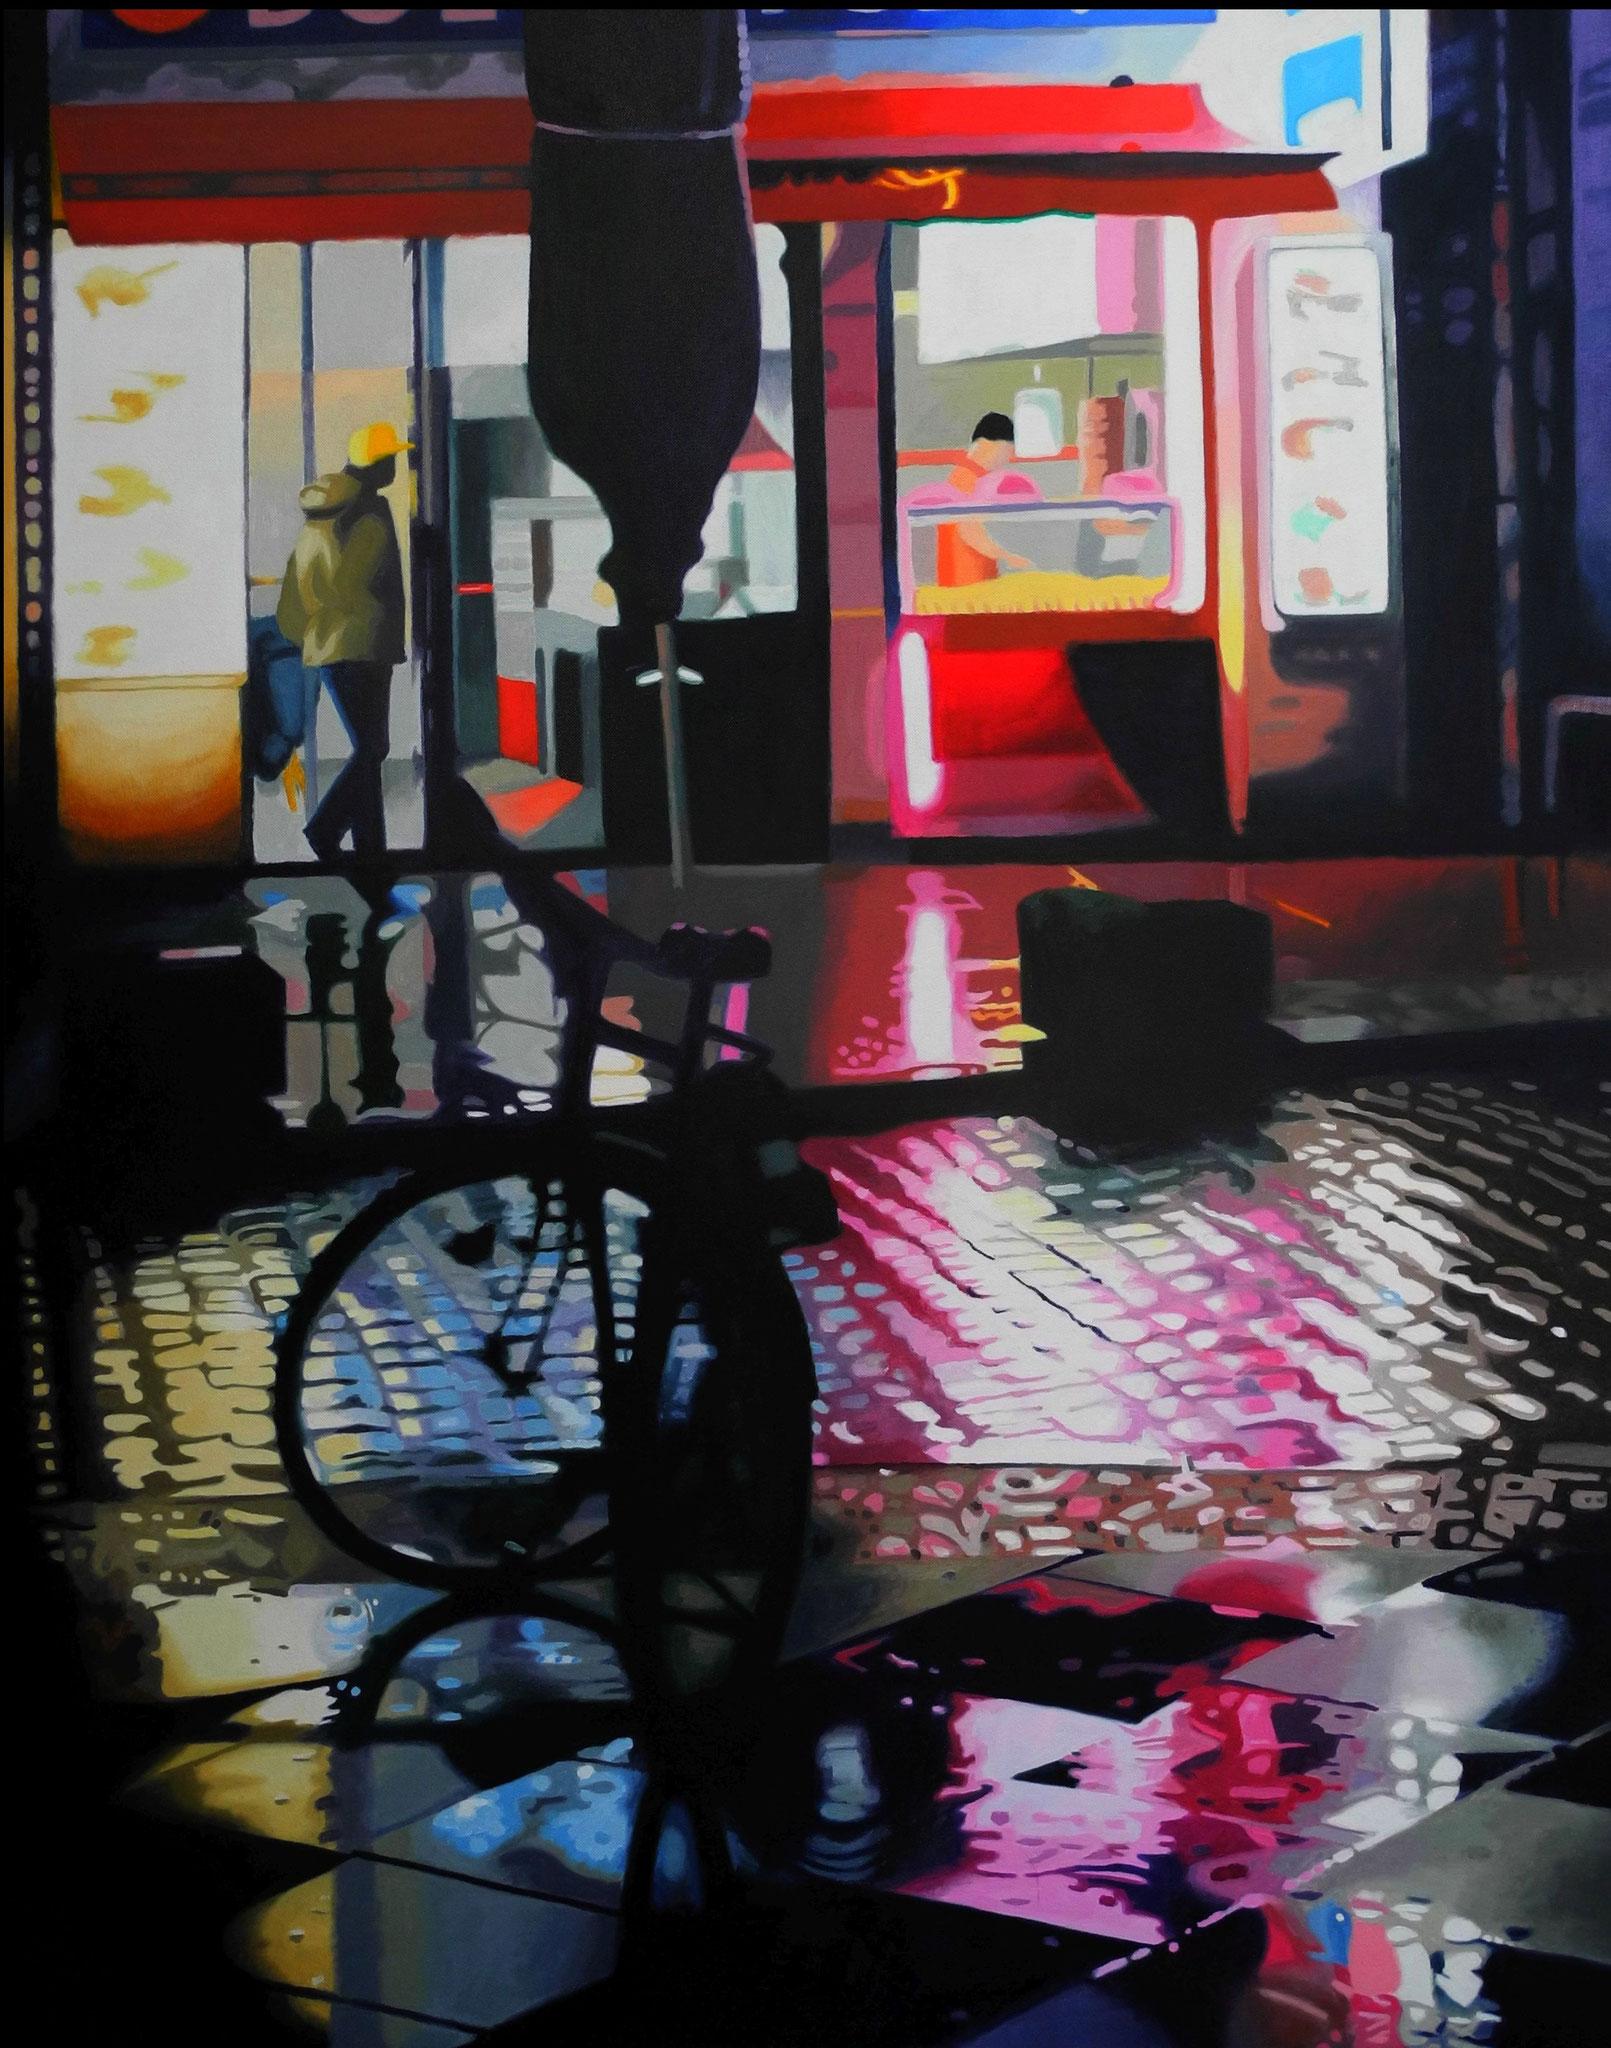 Emmanuel im Imbiss, Oil on Canvas, 100 x 80 cm